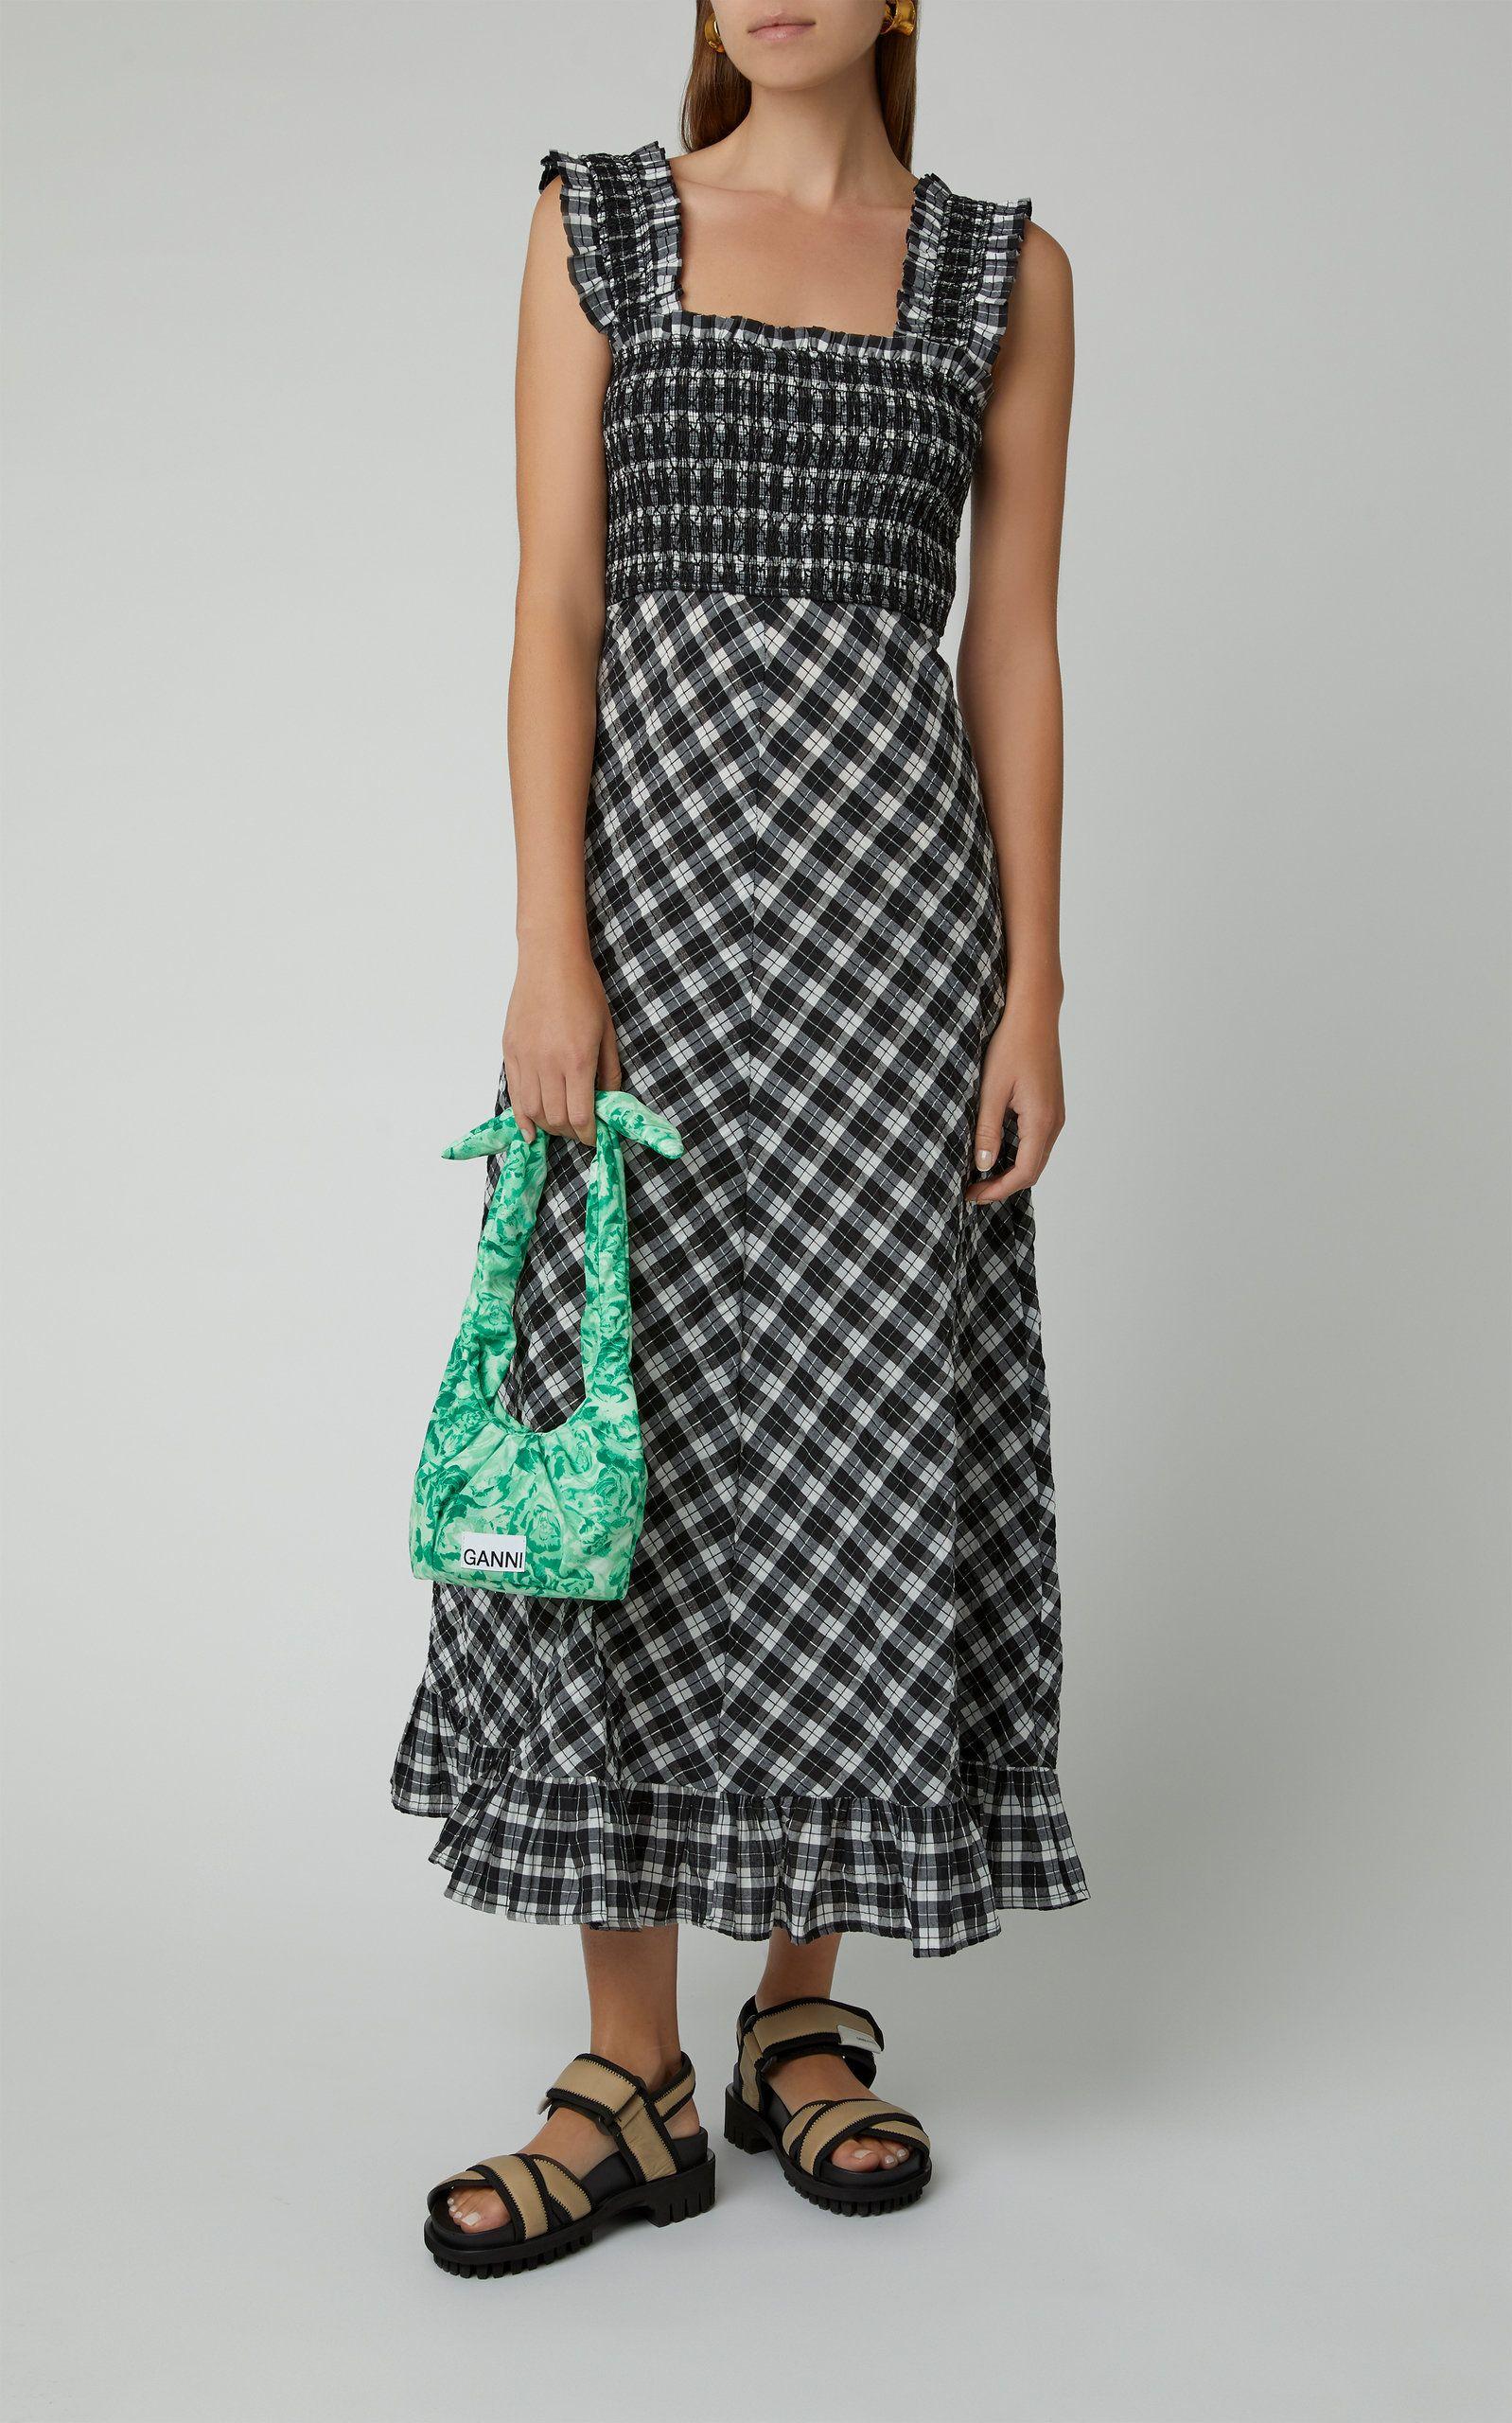 Ganni Smocked Seersucker Check Midi Dress Summer Dress Outfits